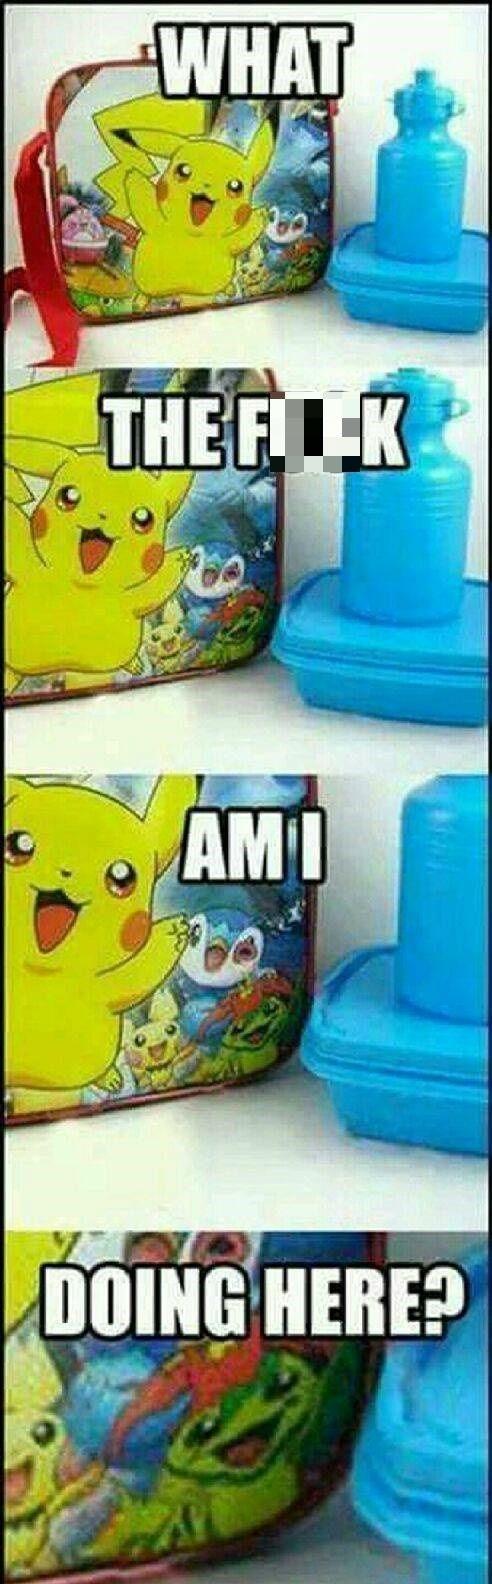 Pokémon wtf palmon pikachu - 8464046336